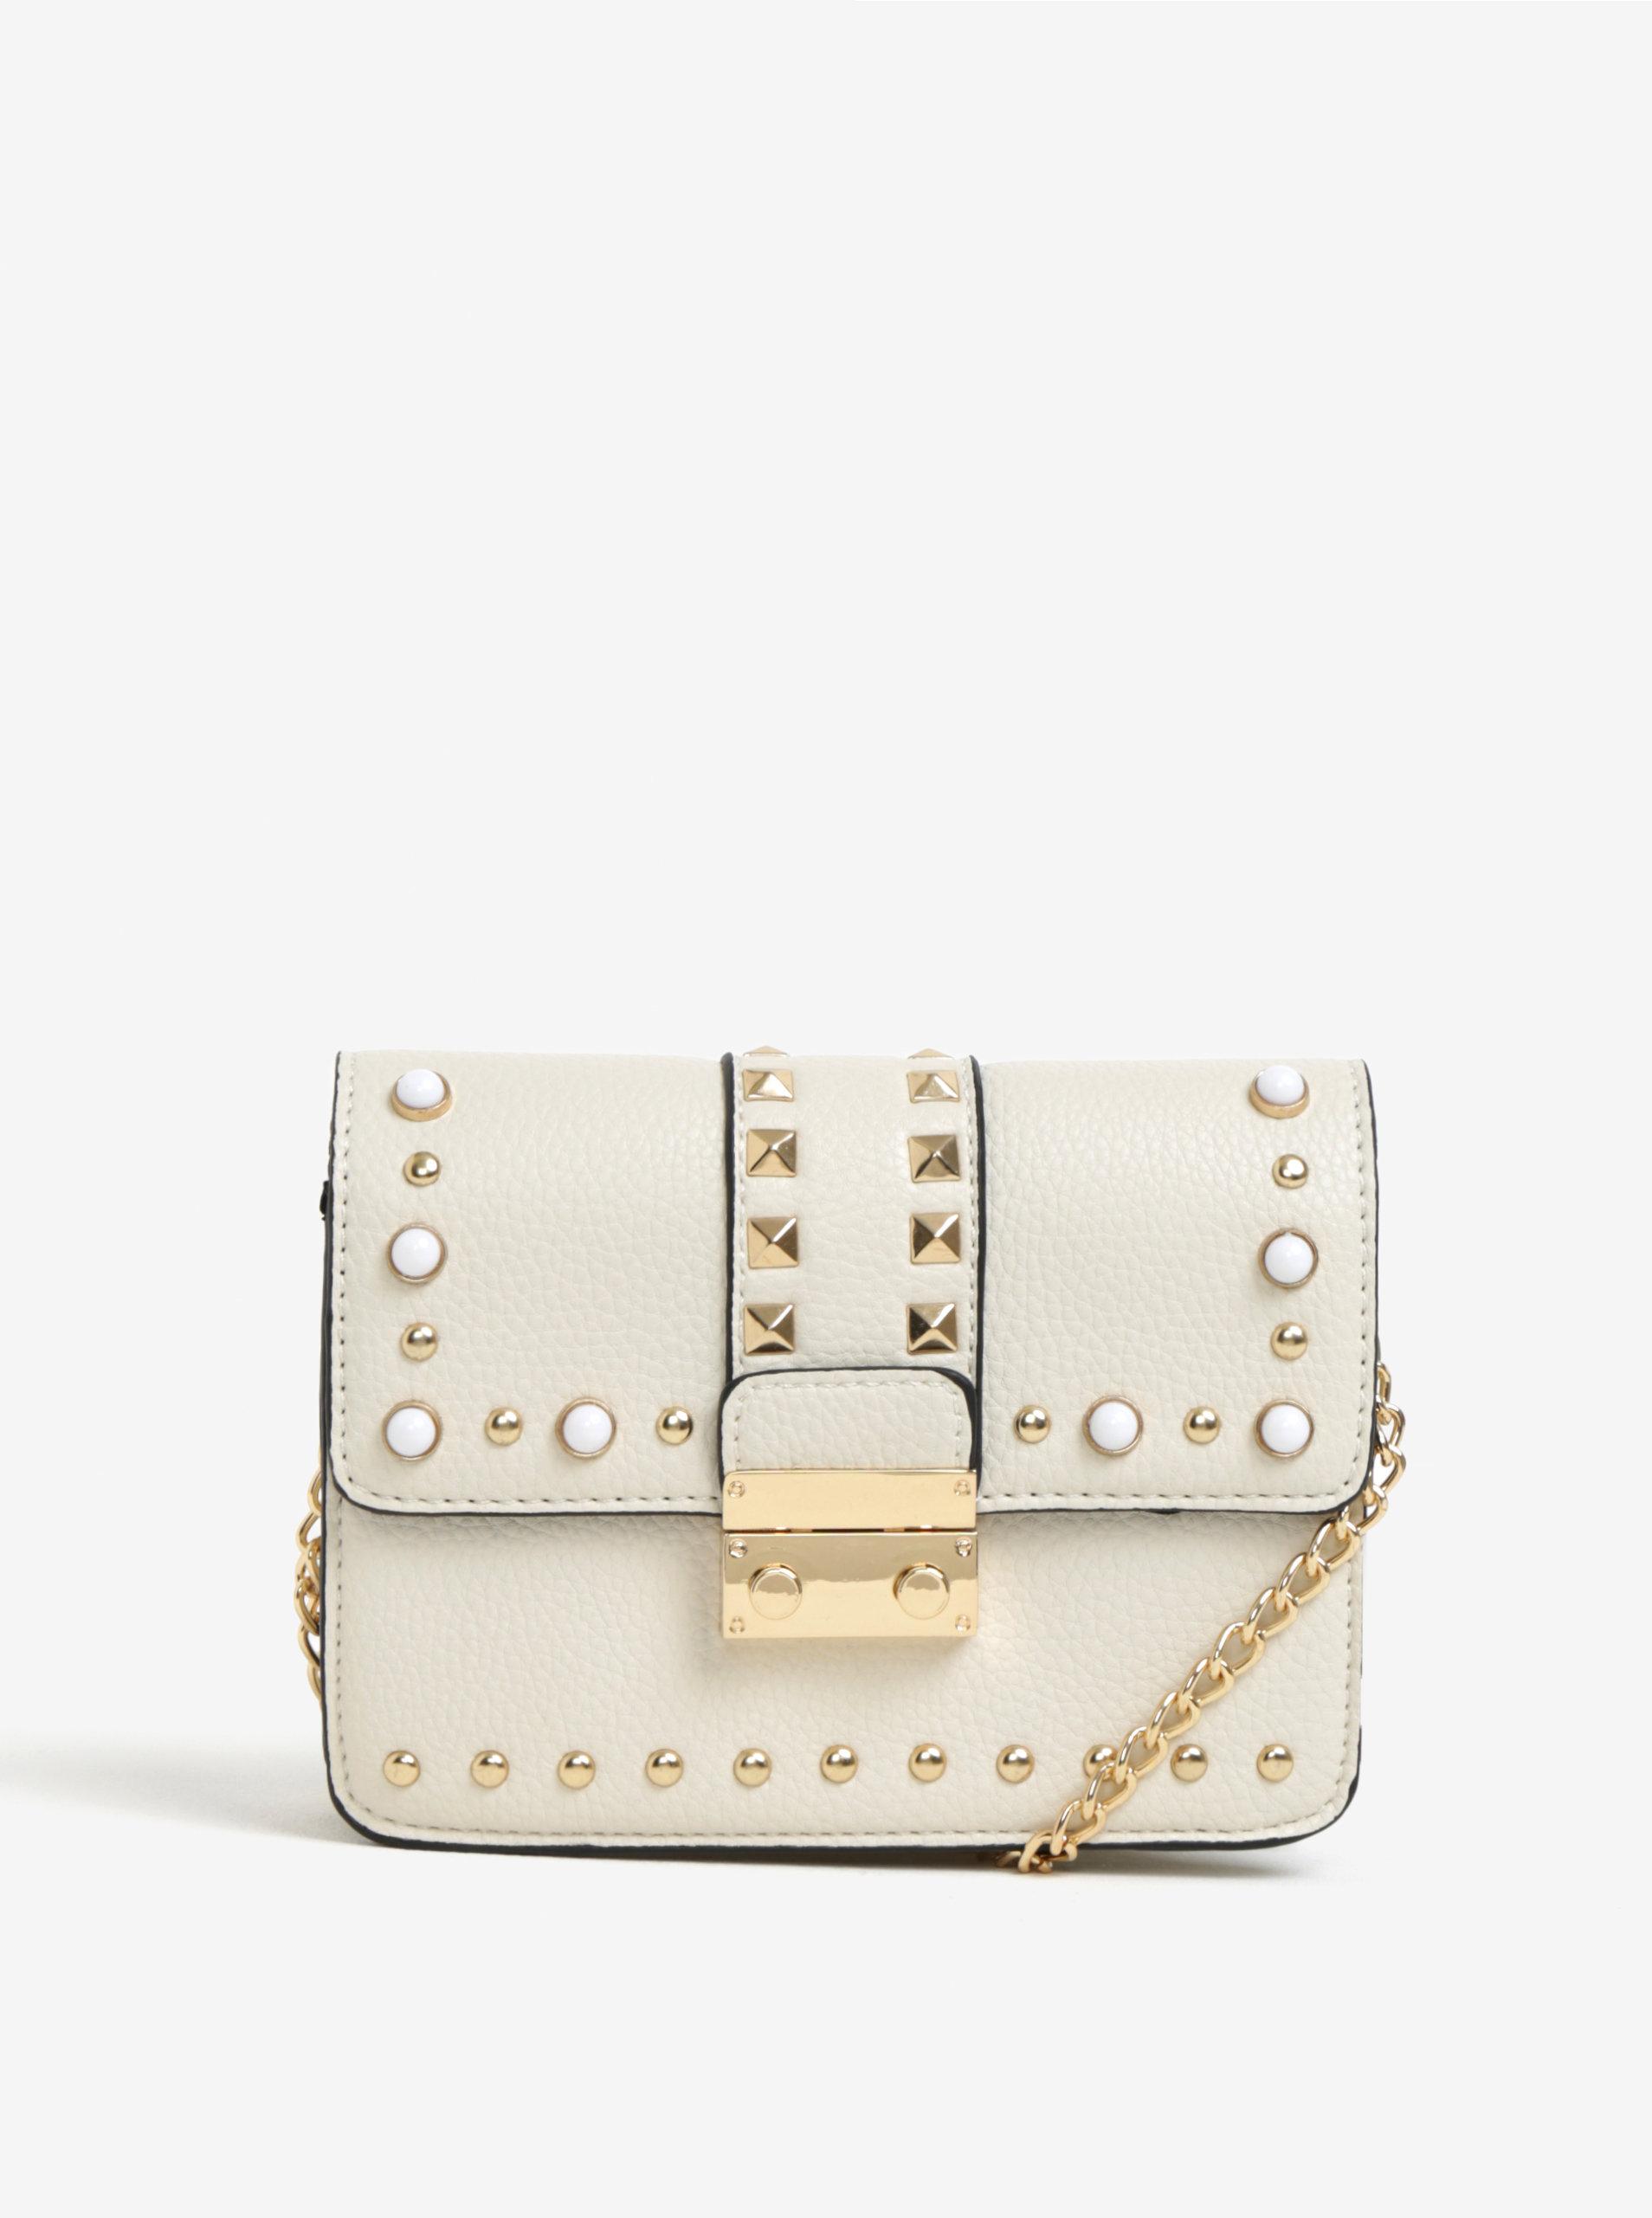 41c1b6ad7396e Krémová crossbody kabelka s detailmi v zlatej farbe Miss Selfridge ...